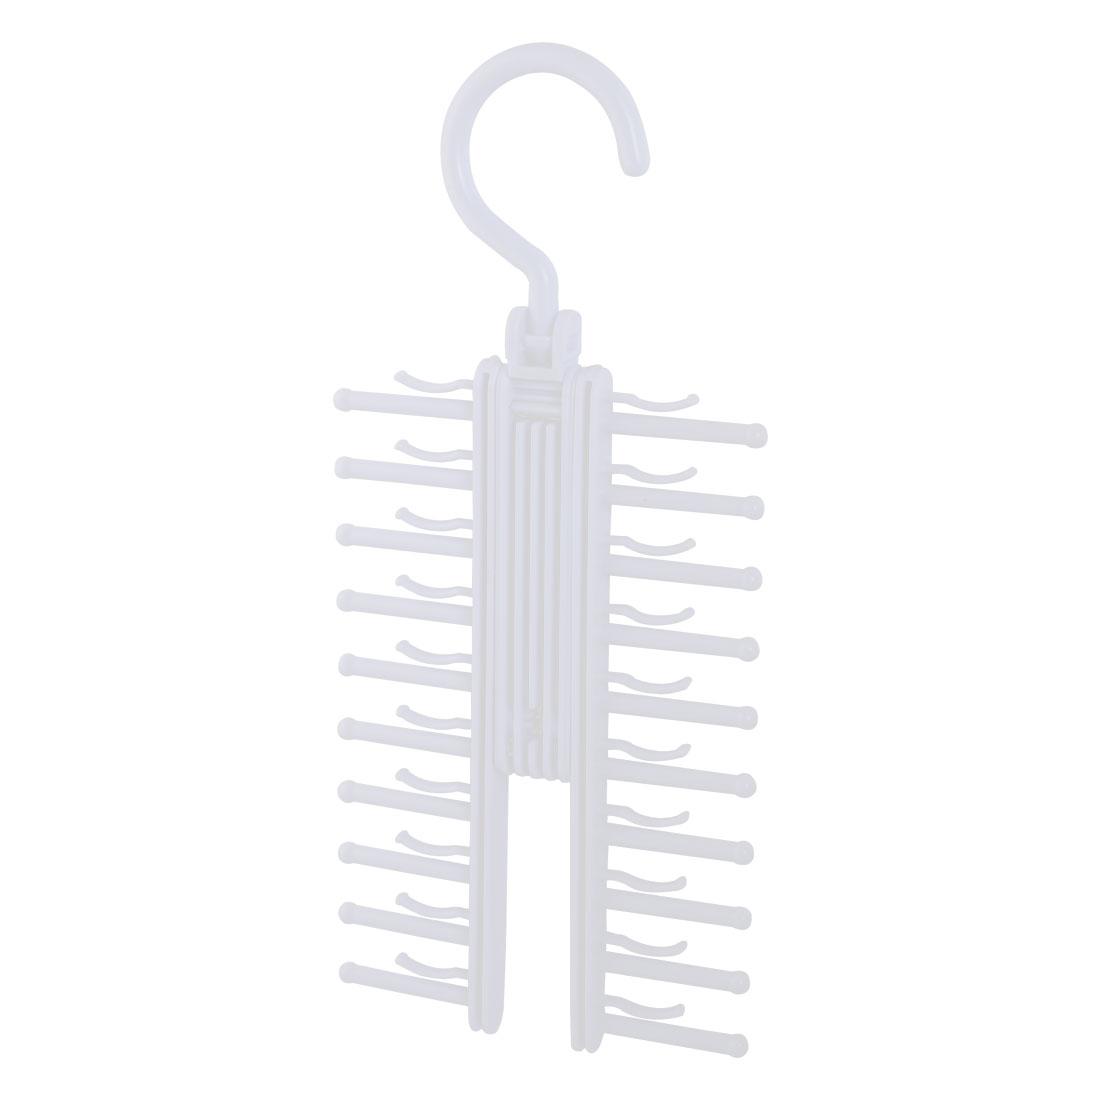 Family House Cloakroom Scarf Belt Necktie Hanger Hook Organizer White